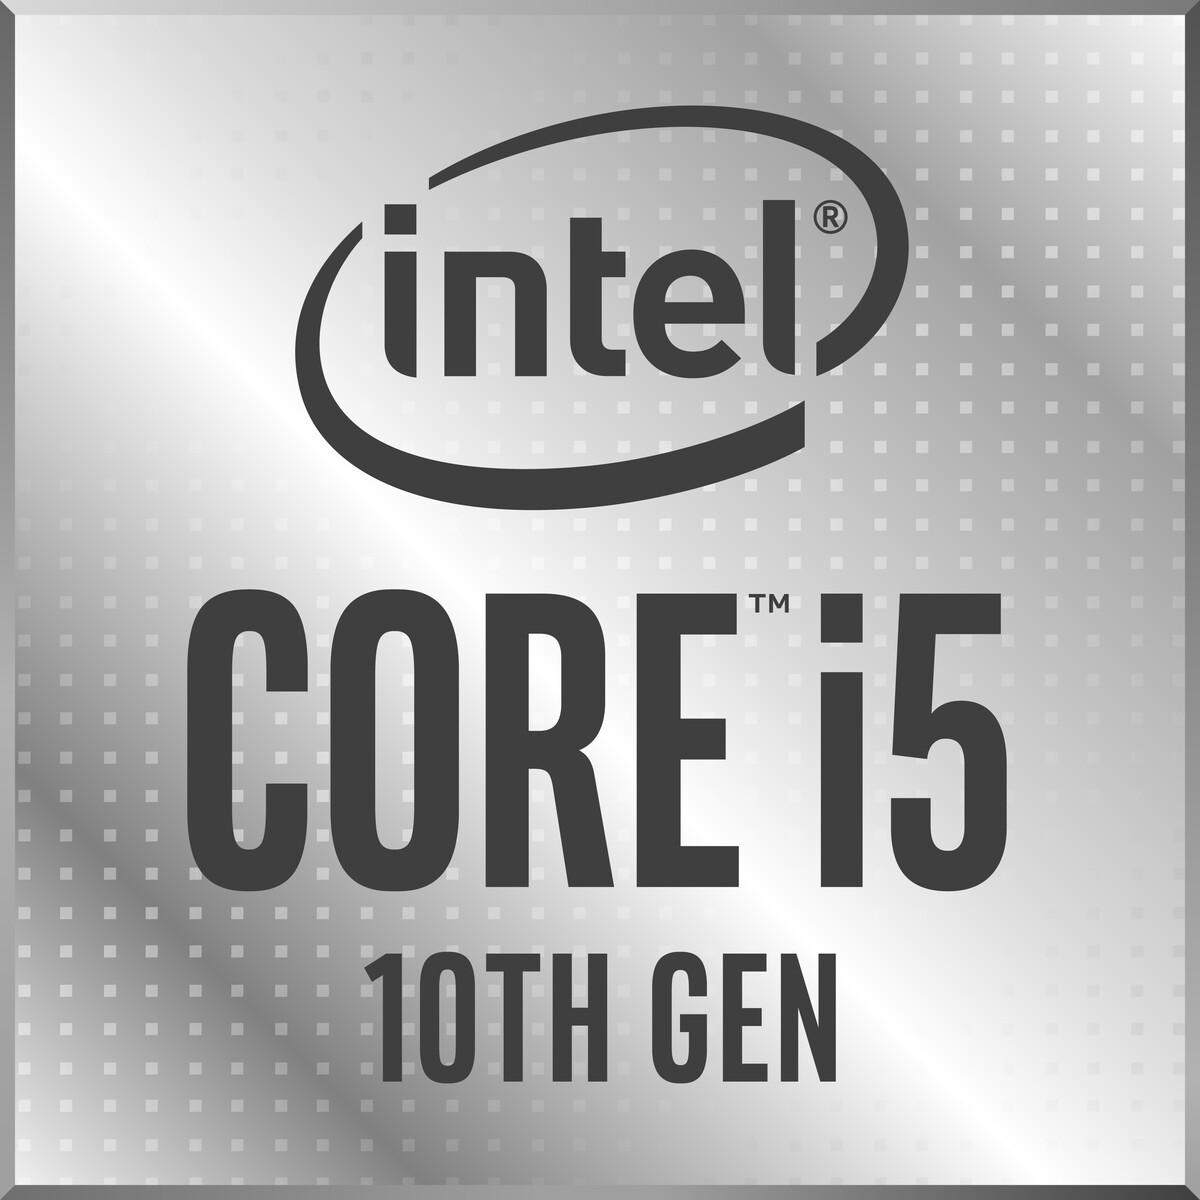 Intel Core I5 10300h Vs Amd Ryzen 7 3750h Another Sideways Step For Intel Notebookcheck Net News